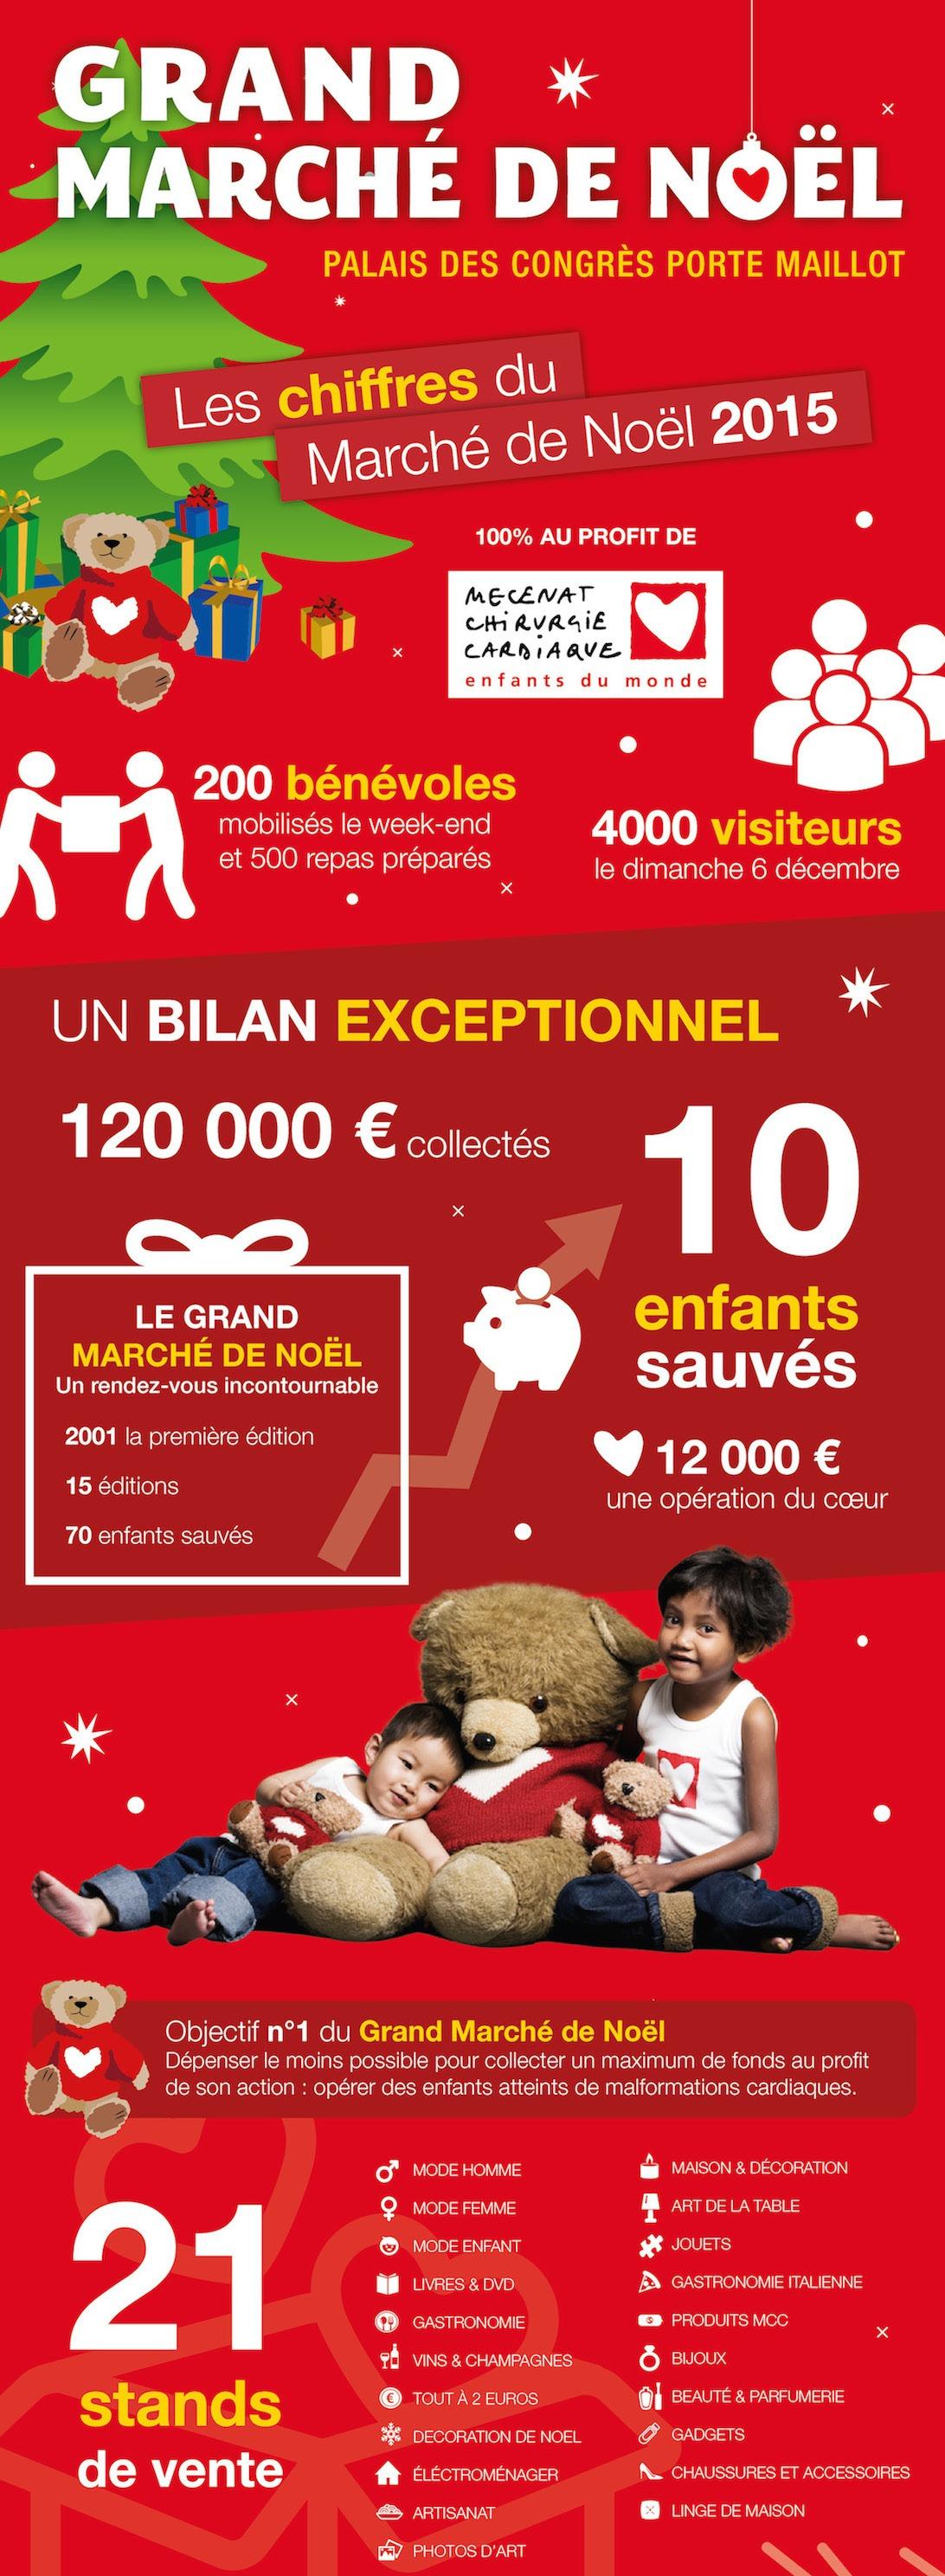 1 Résultats Marché de Noël 2015 & Visoanska